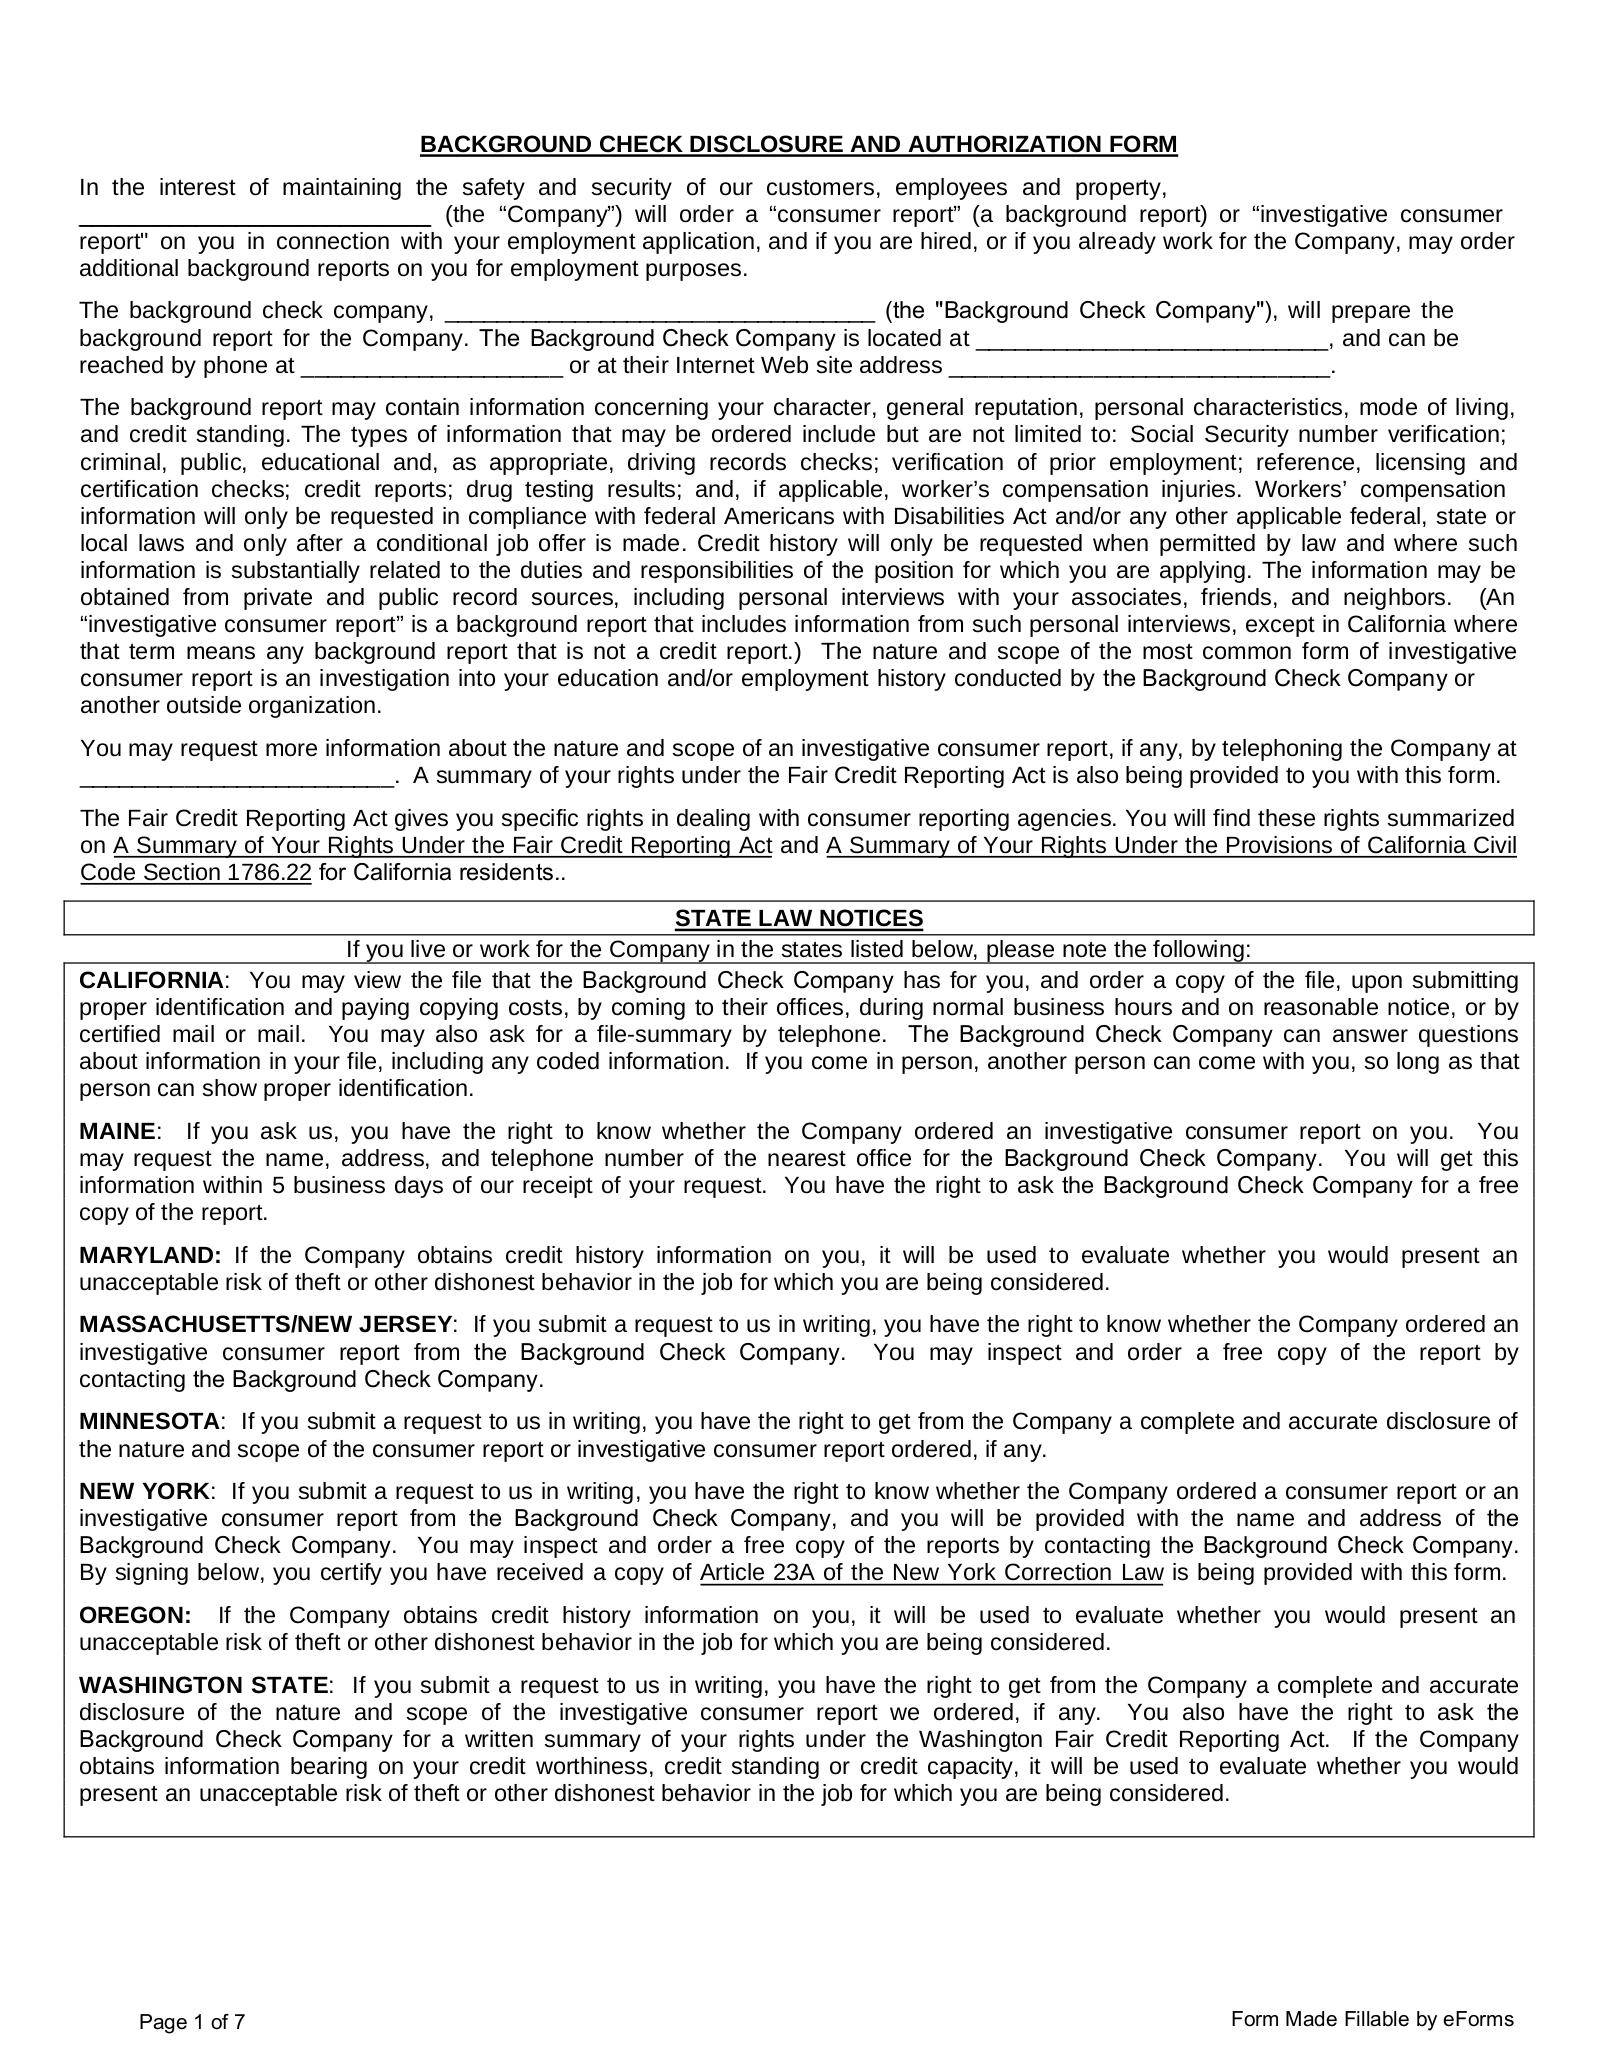 Free Background Check Authorization Form - PDF | eForms